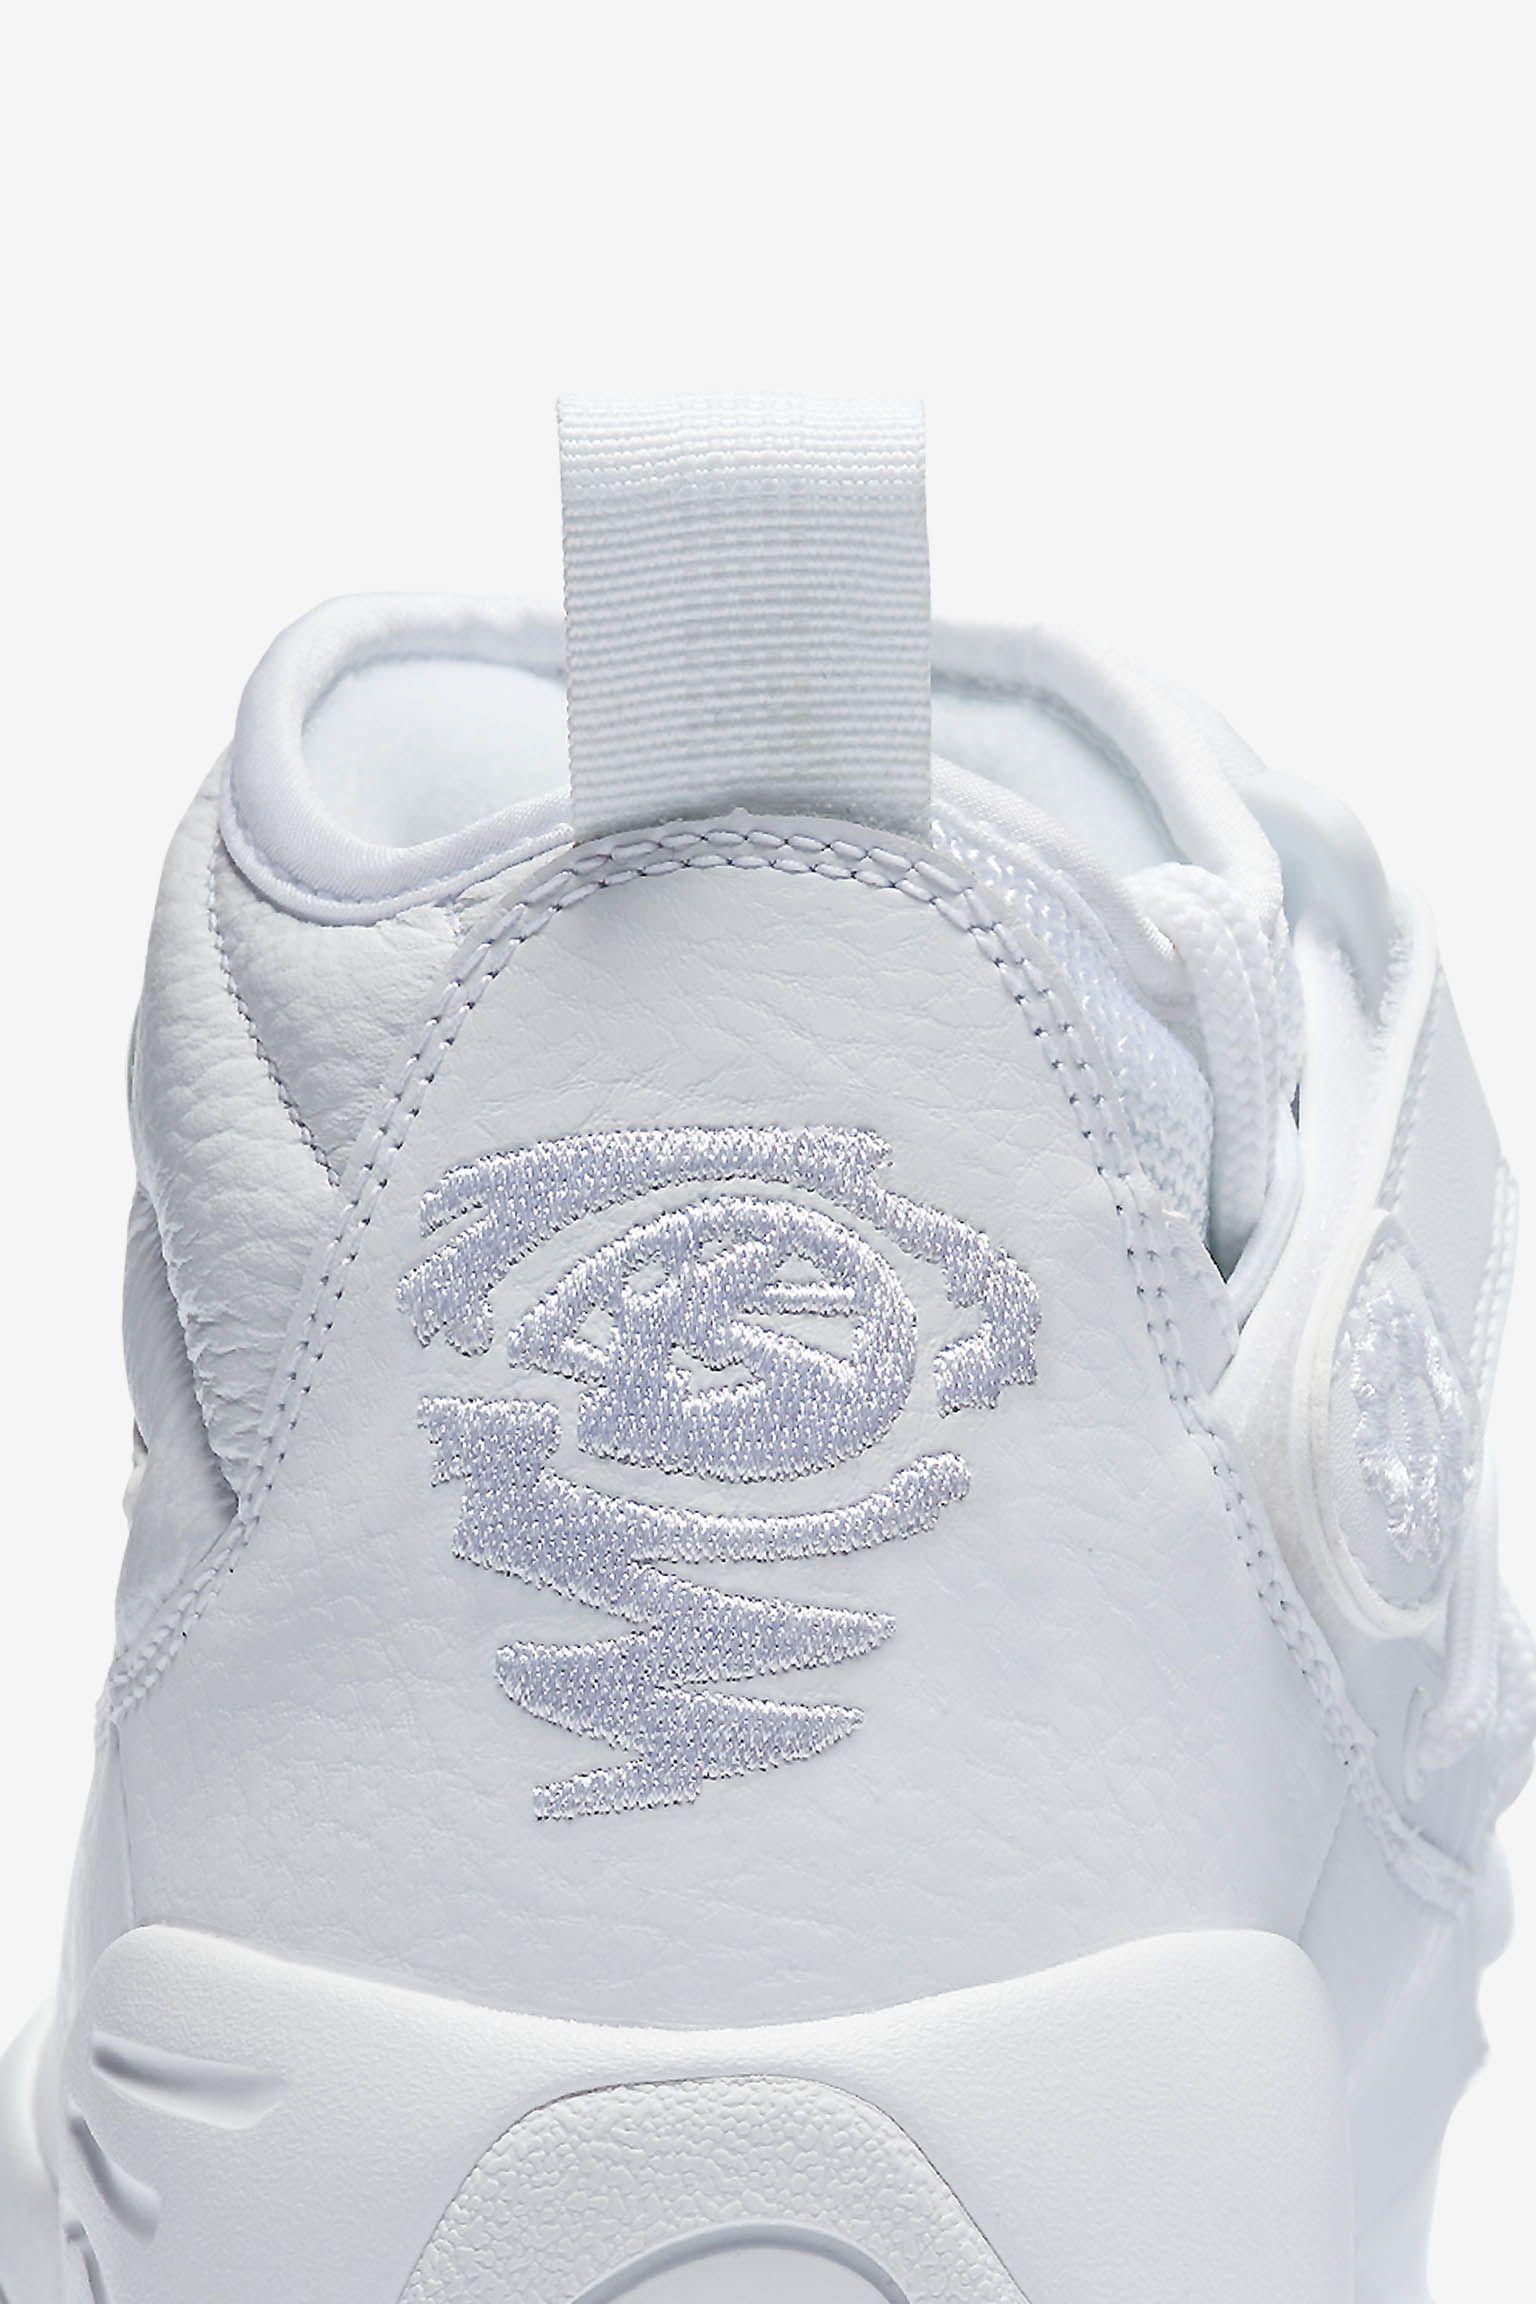 Nike Air Shake Ndestrukt 'Triple White'